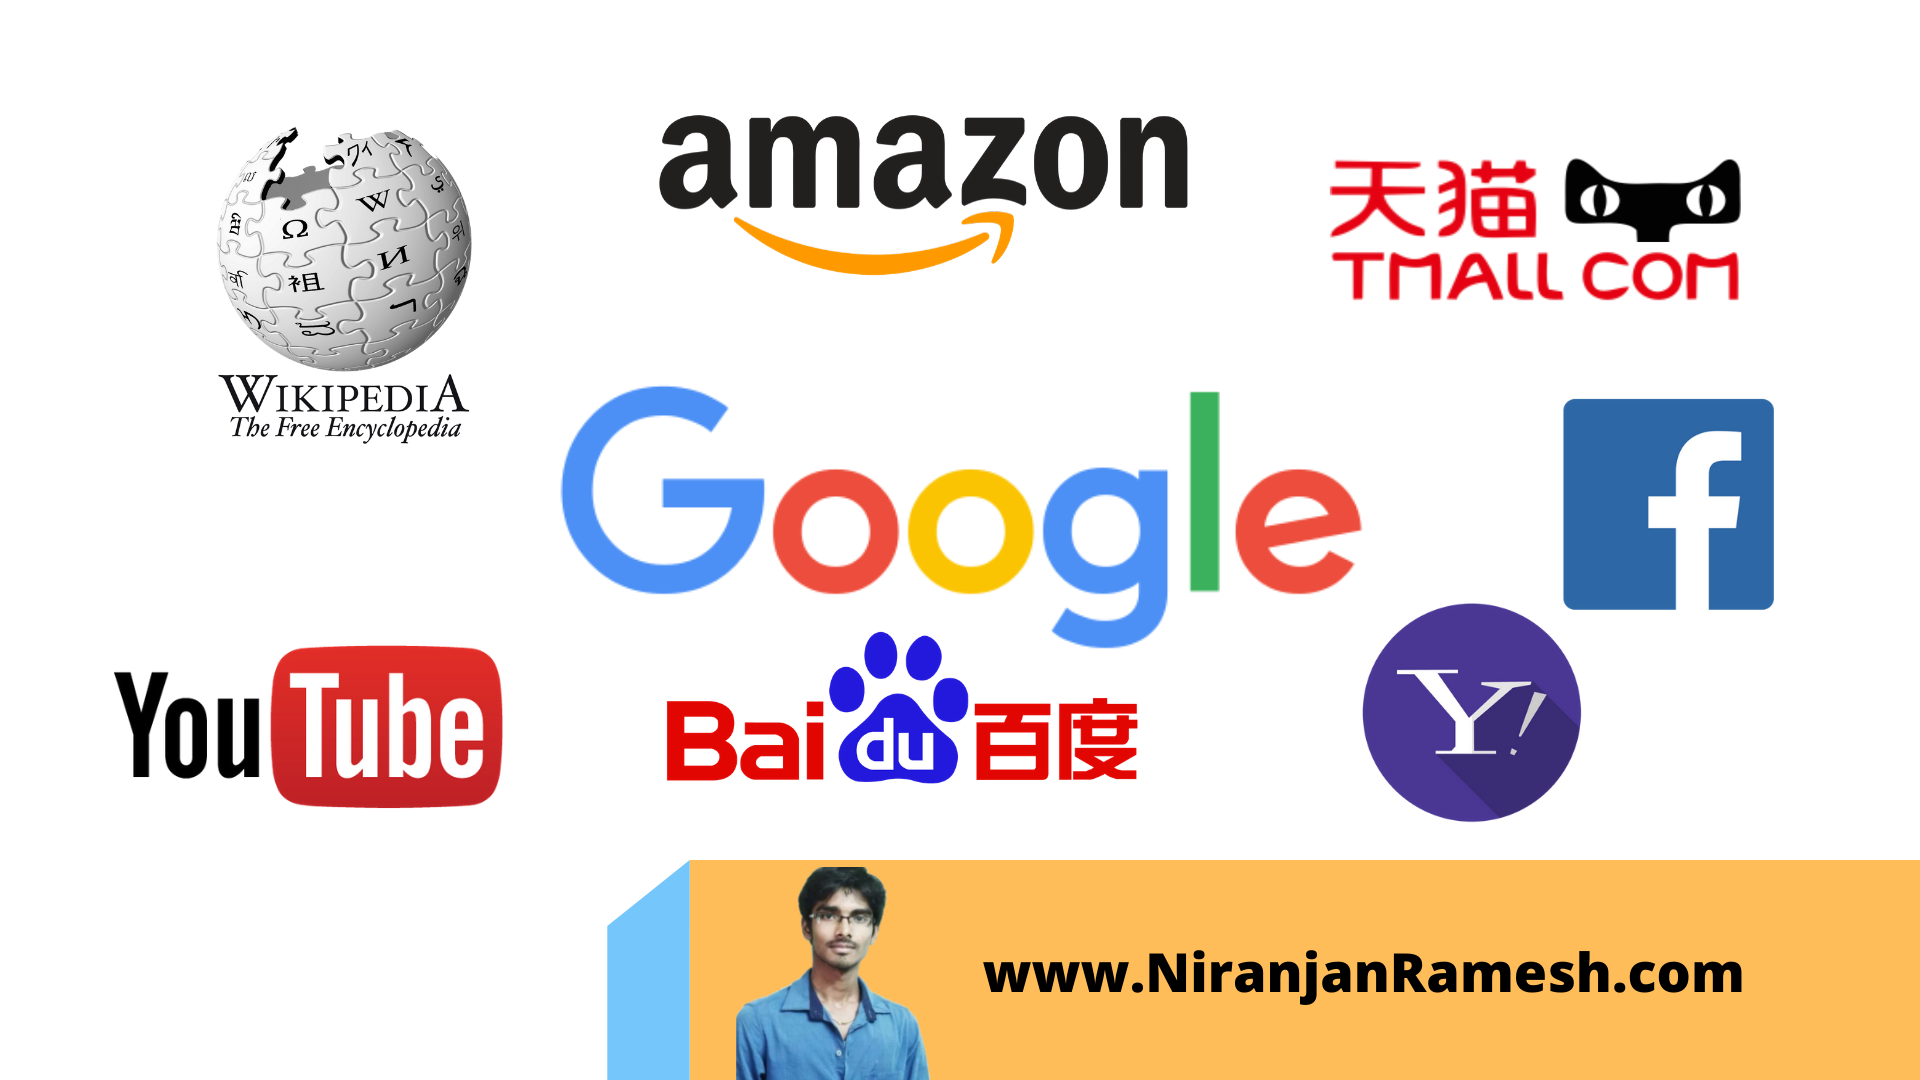 Top-25-used-websites-around-world-in-2019-Check-out-Niranjan-Ramesh-Babu